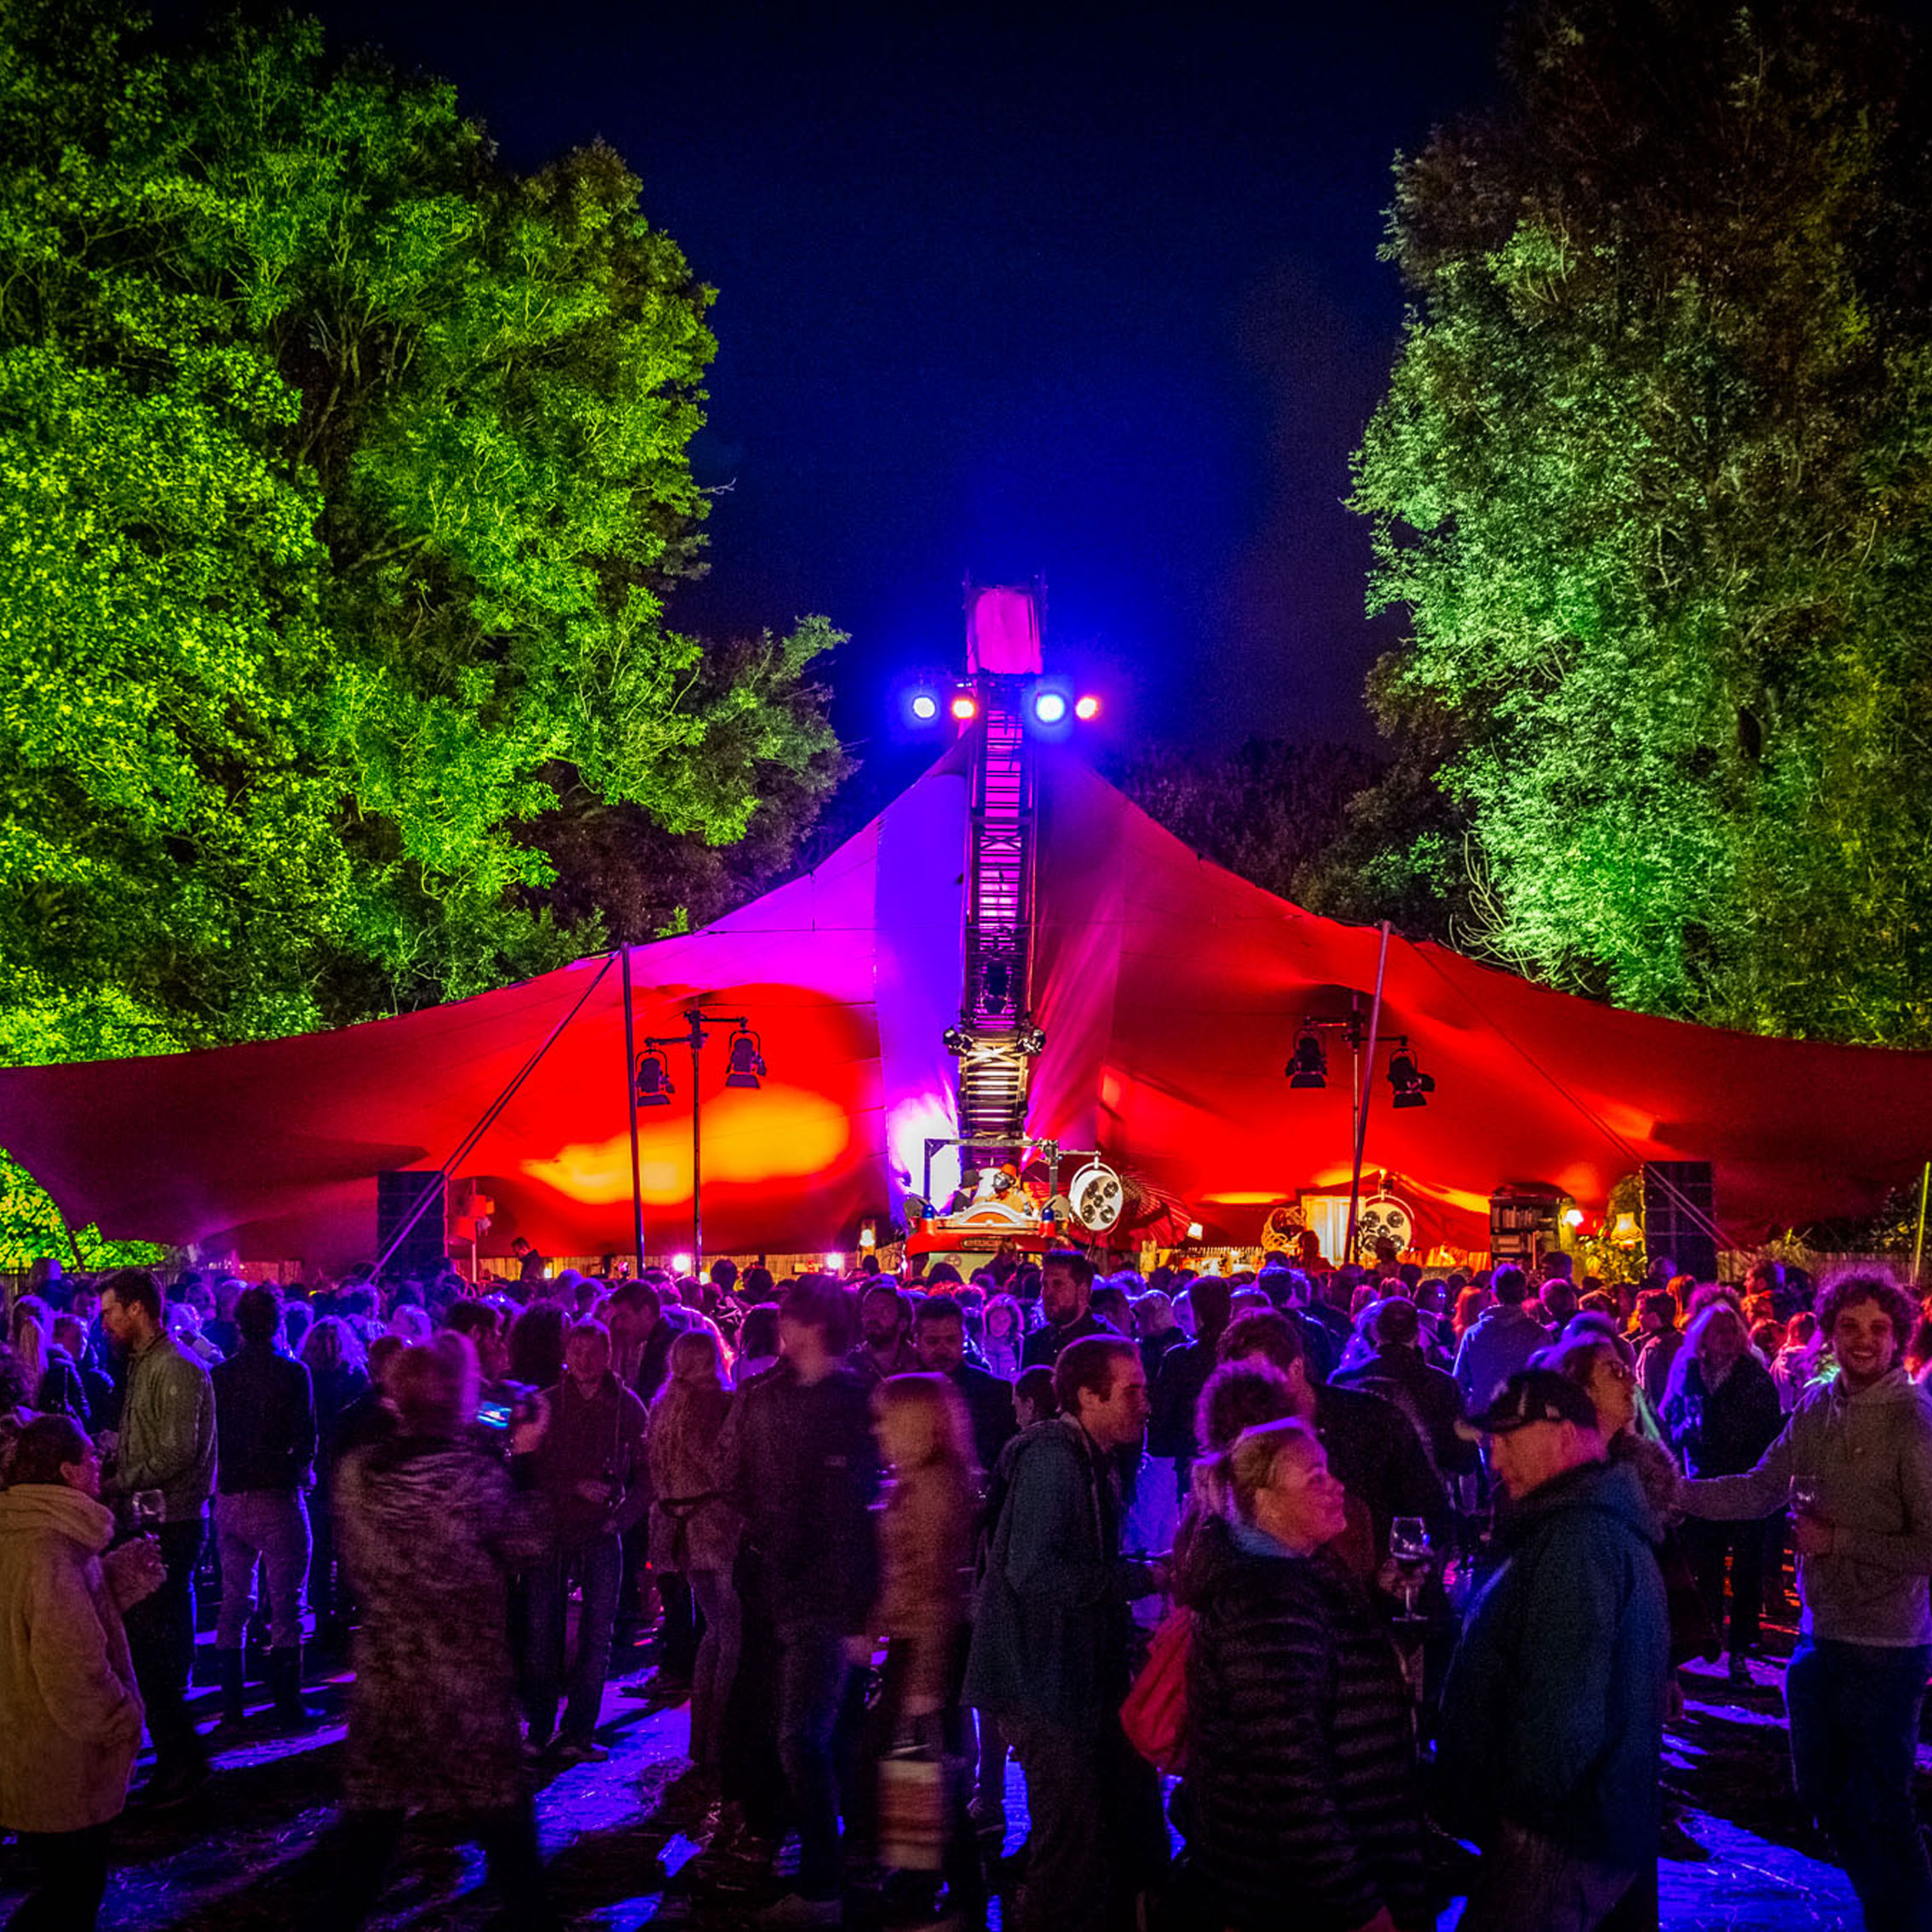 Bacchus Wijnfestival 2015